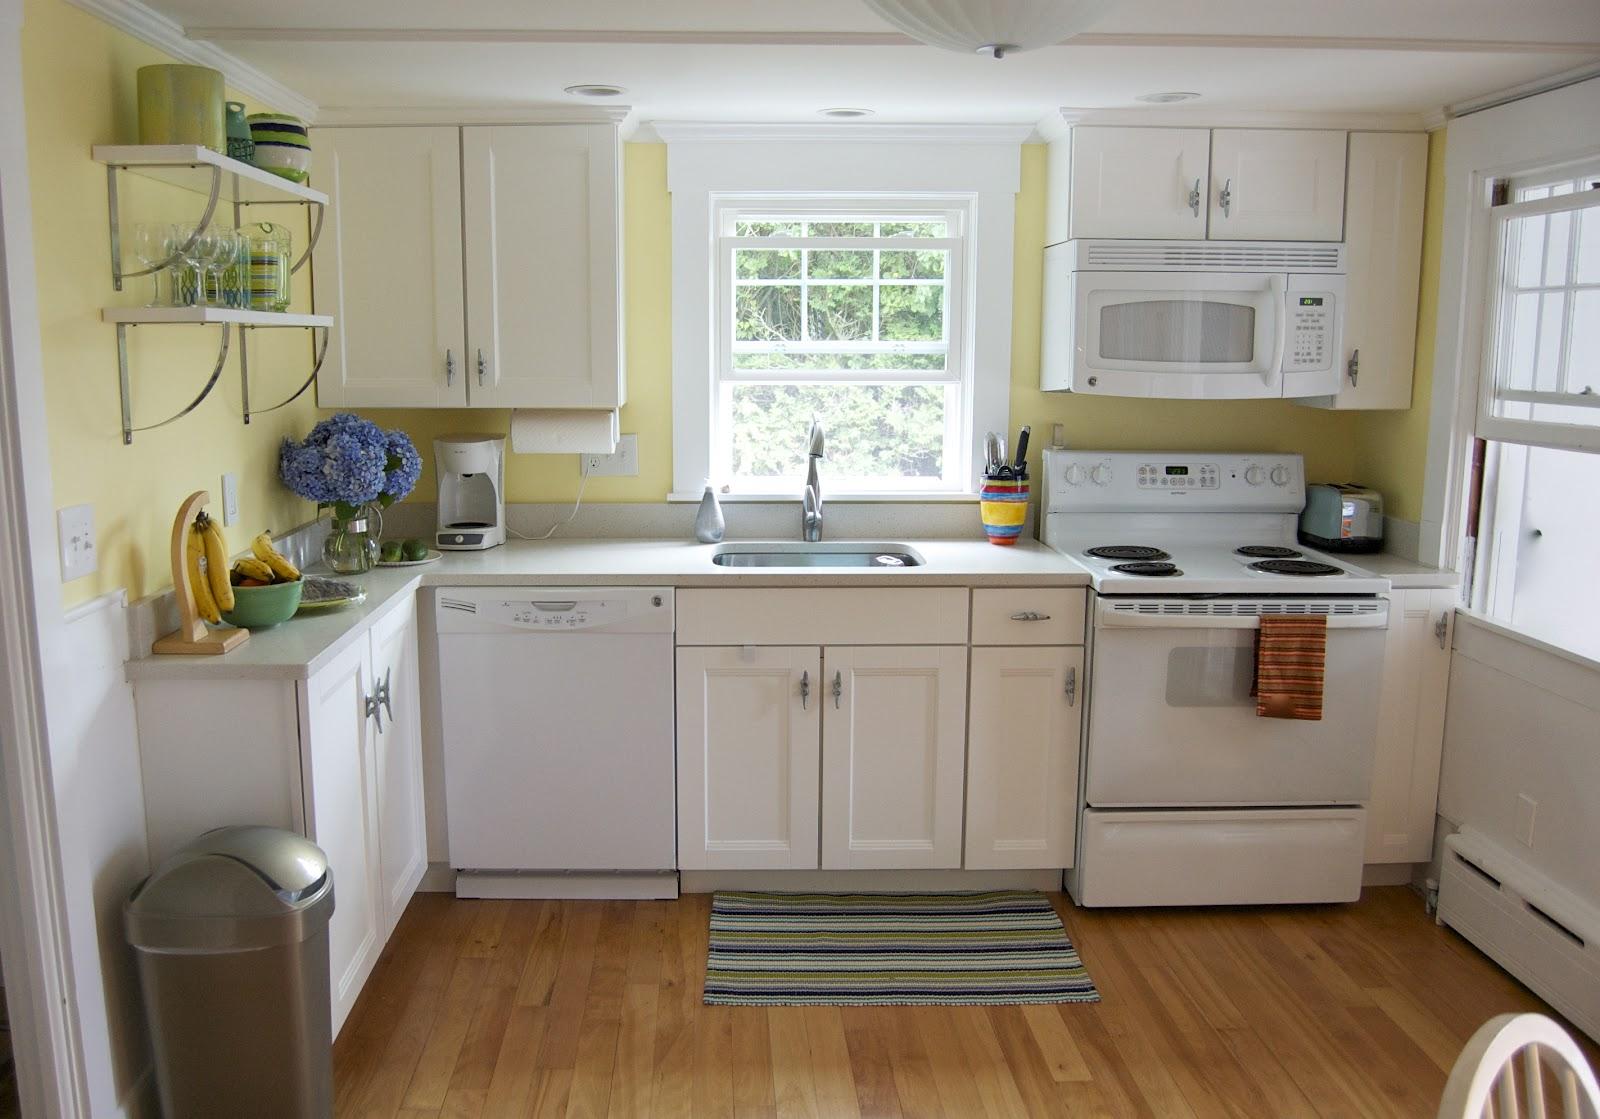 Seaside shelter cottage kitchen update phase 2 for Coastal cottage kitchen ideas